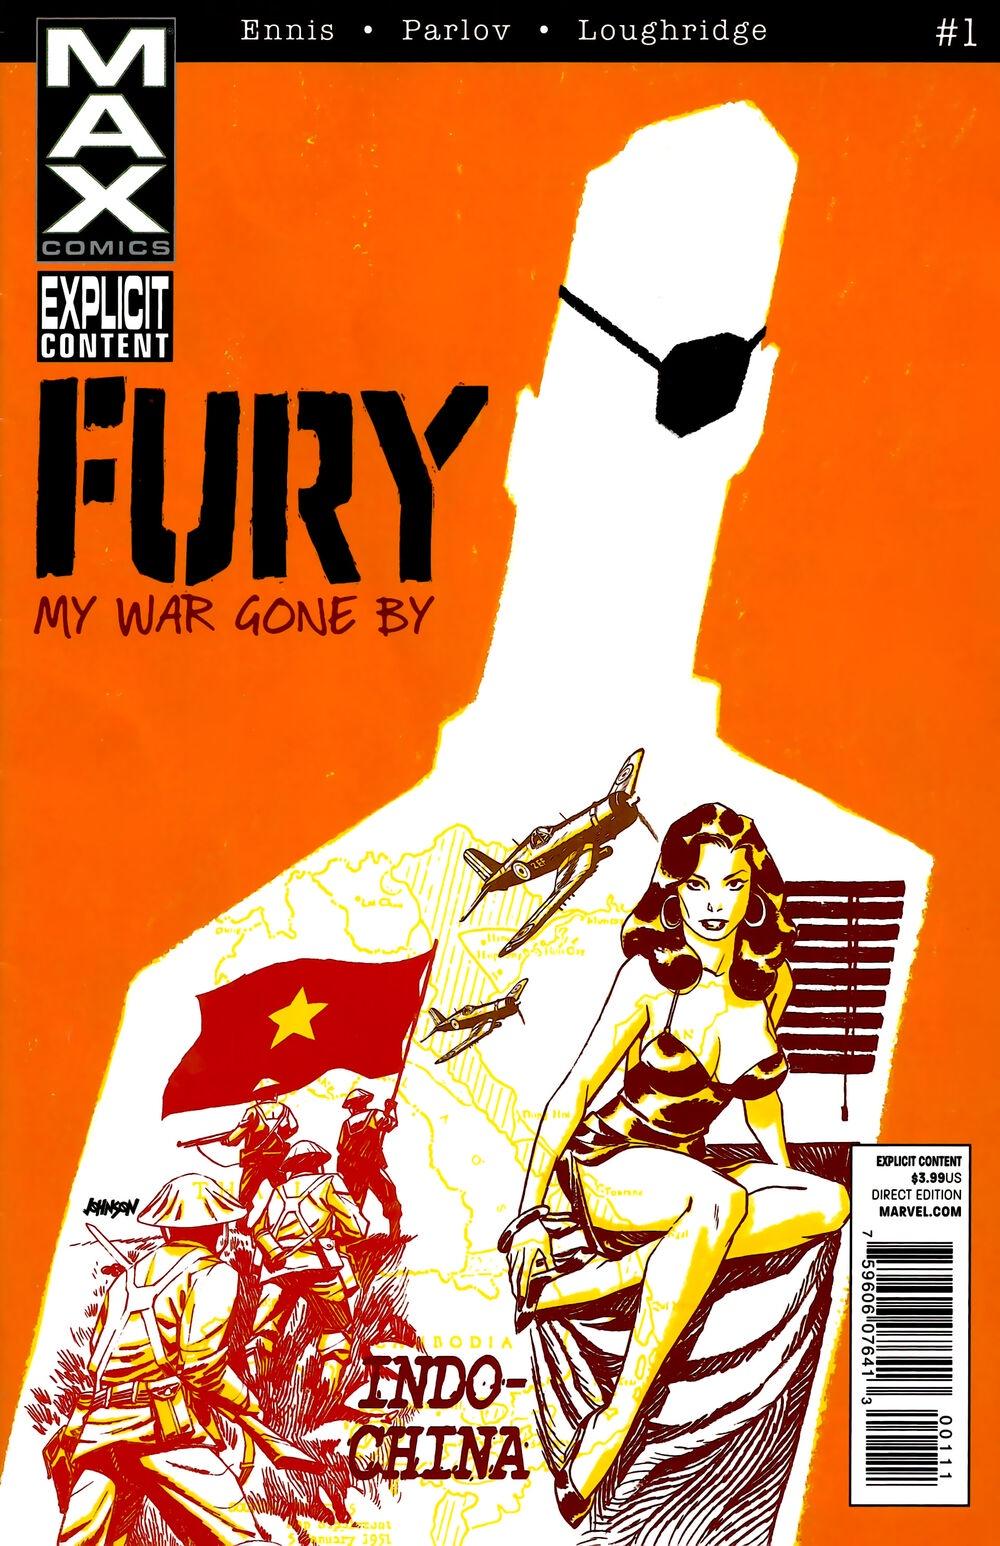 Ennis Parlov Loughridge Fury Max (2012 Marvel) #1 zeiler thomas w a companion to world war ii